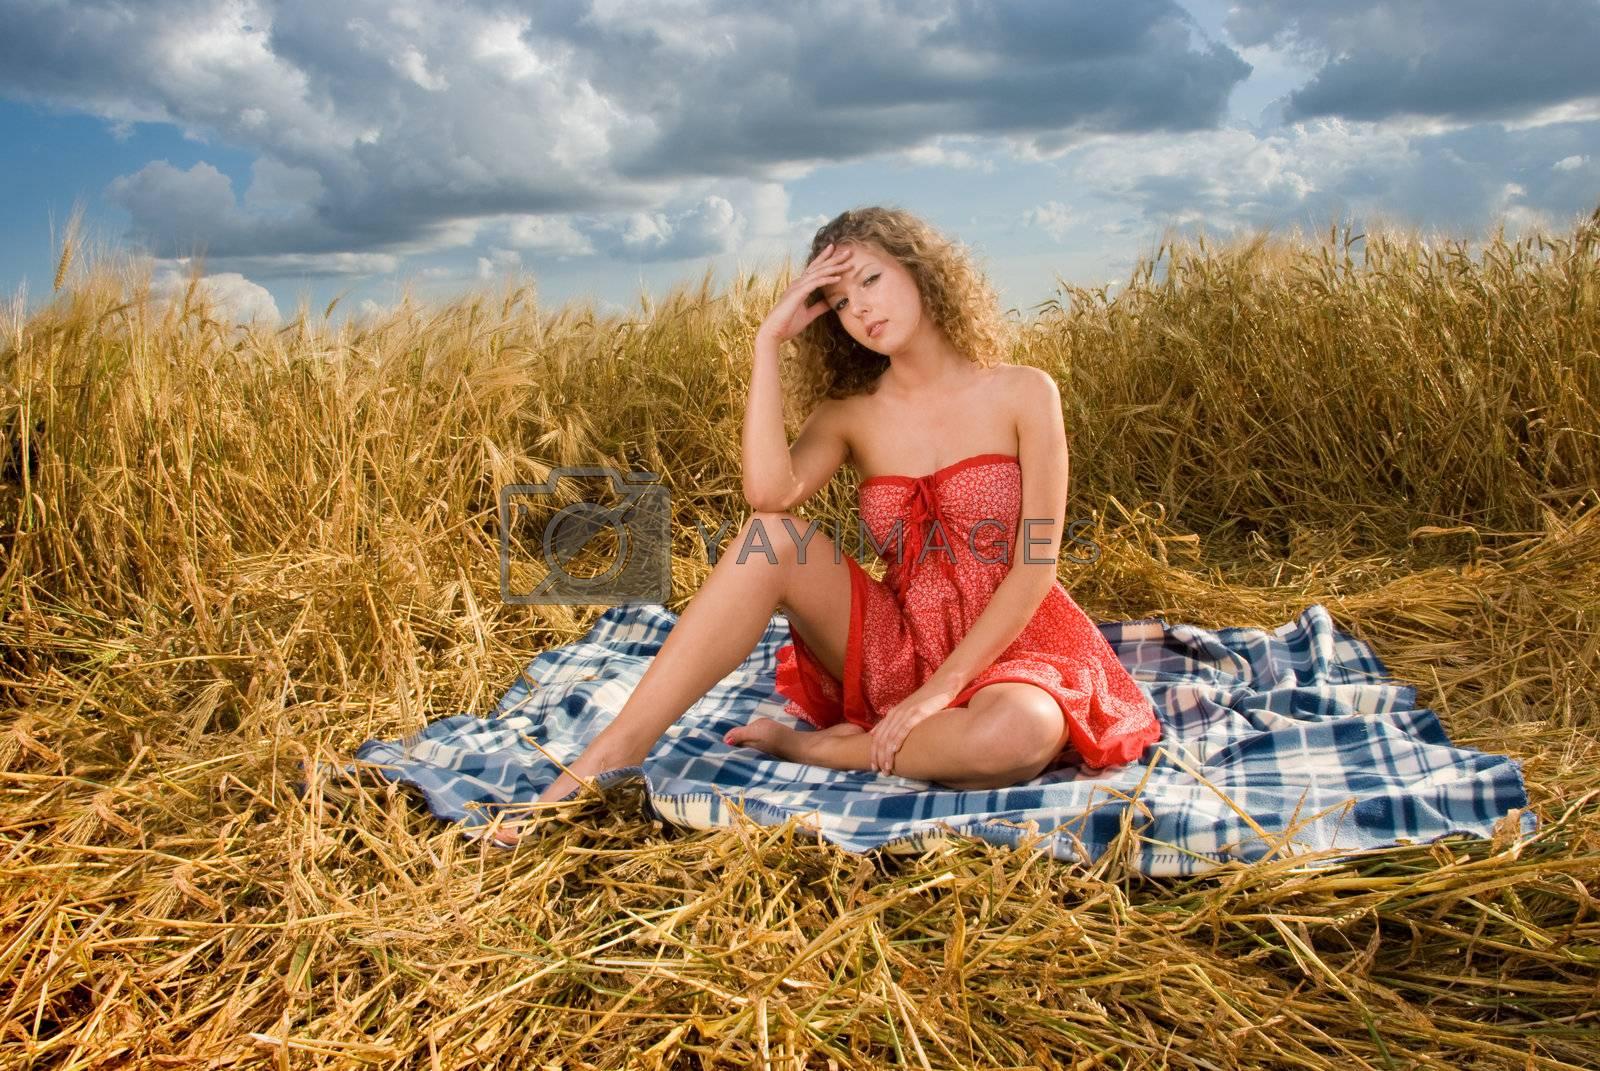 Beautiful slavonic girl on picnic in wheat field